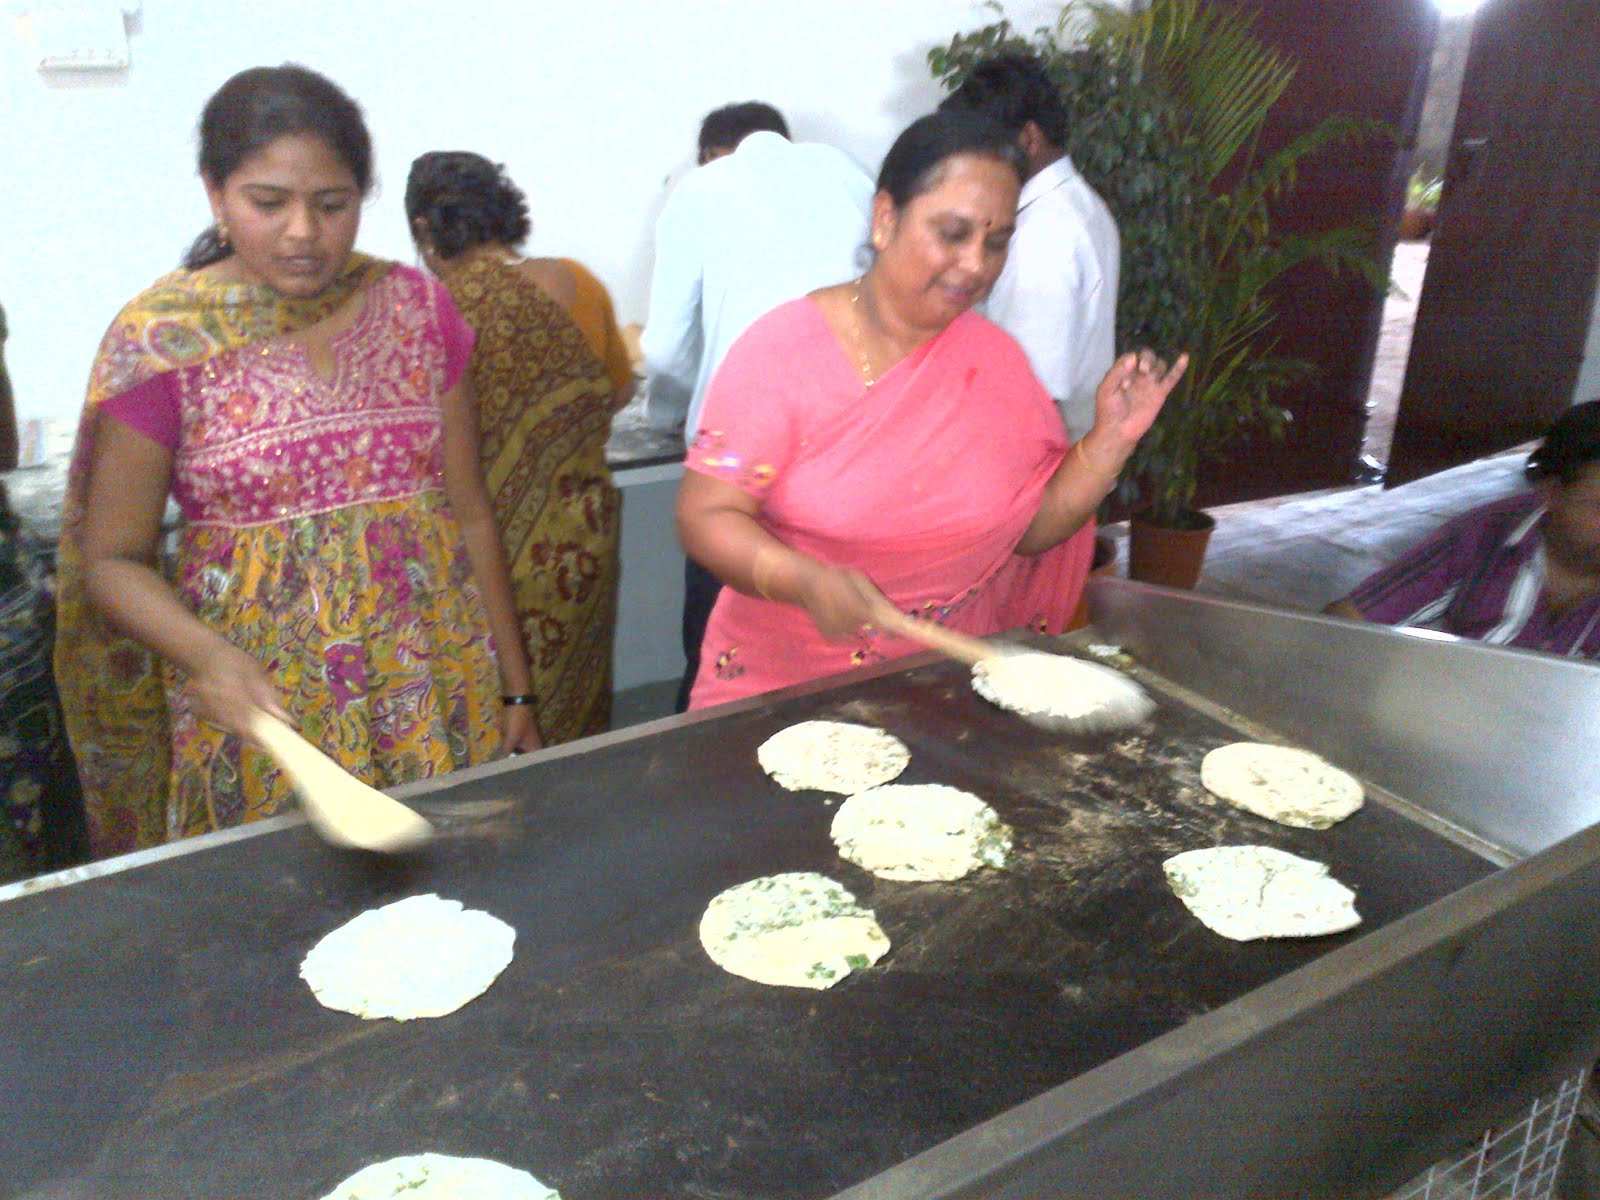 Recipes pdf satyanarayana raju manthena